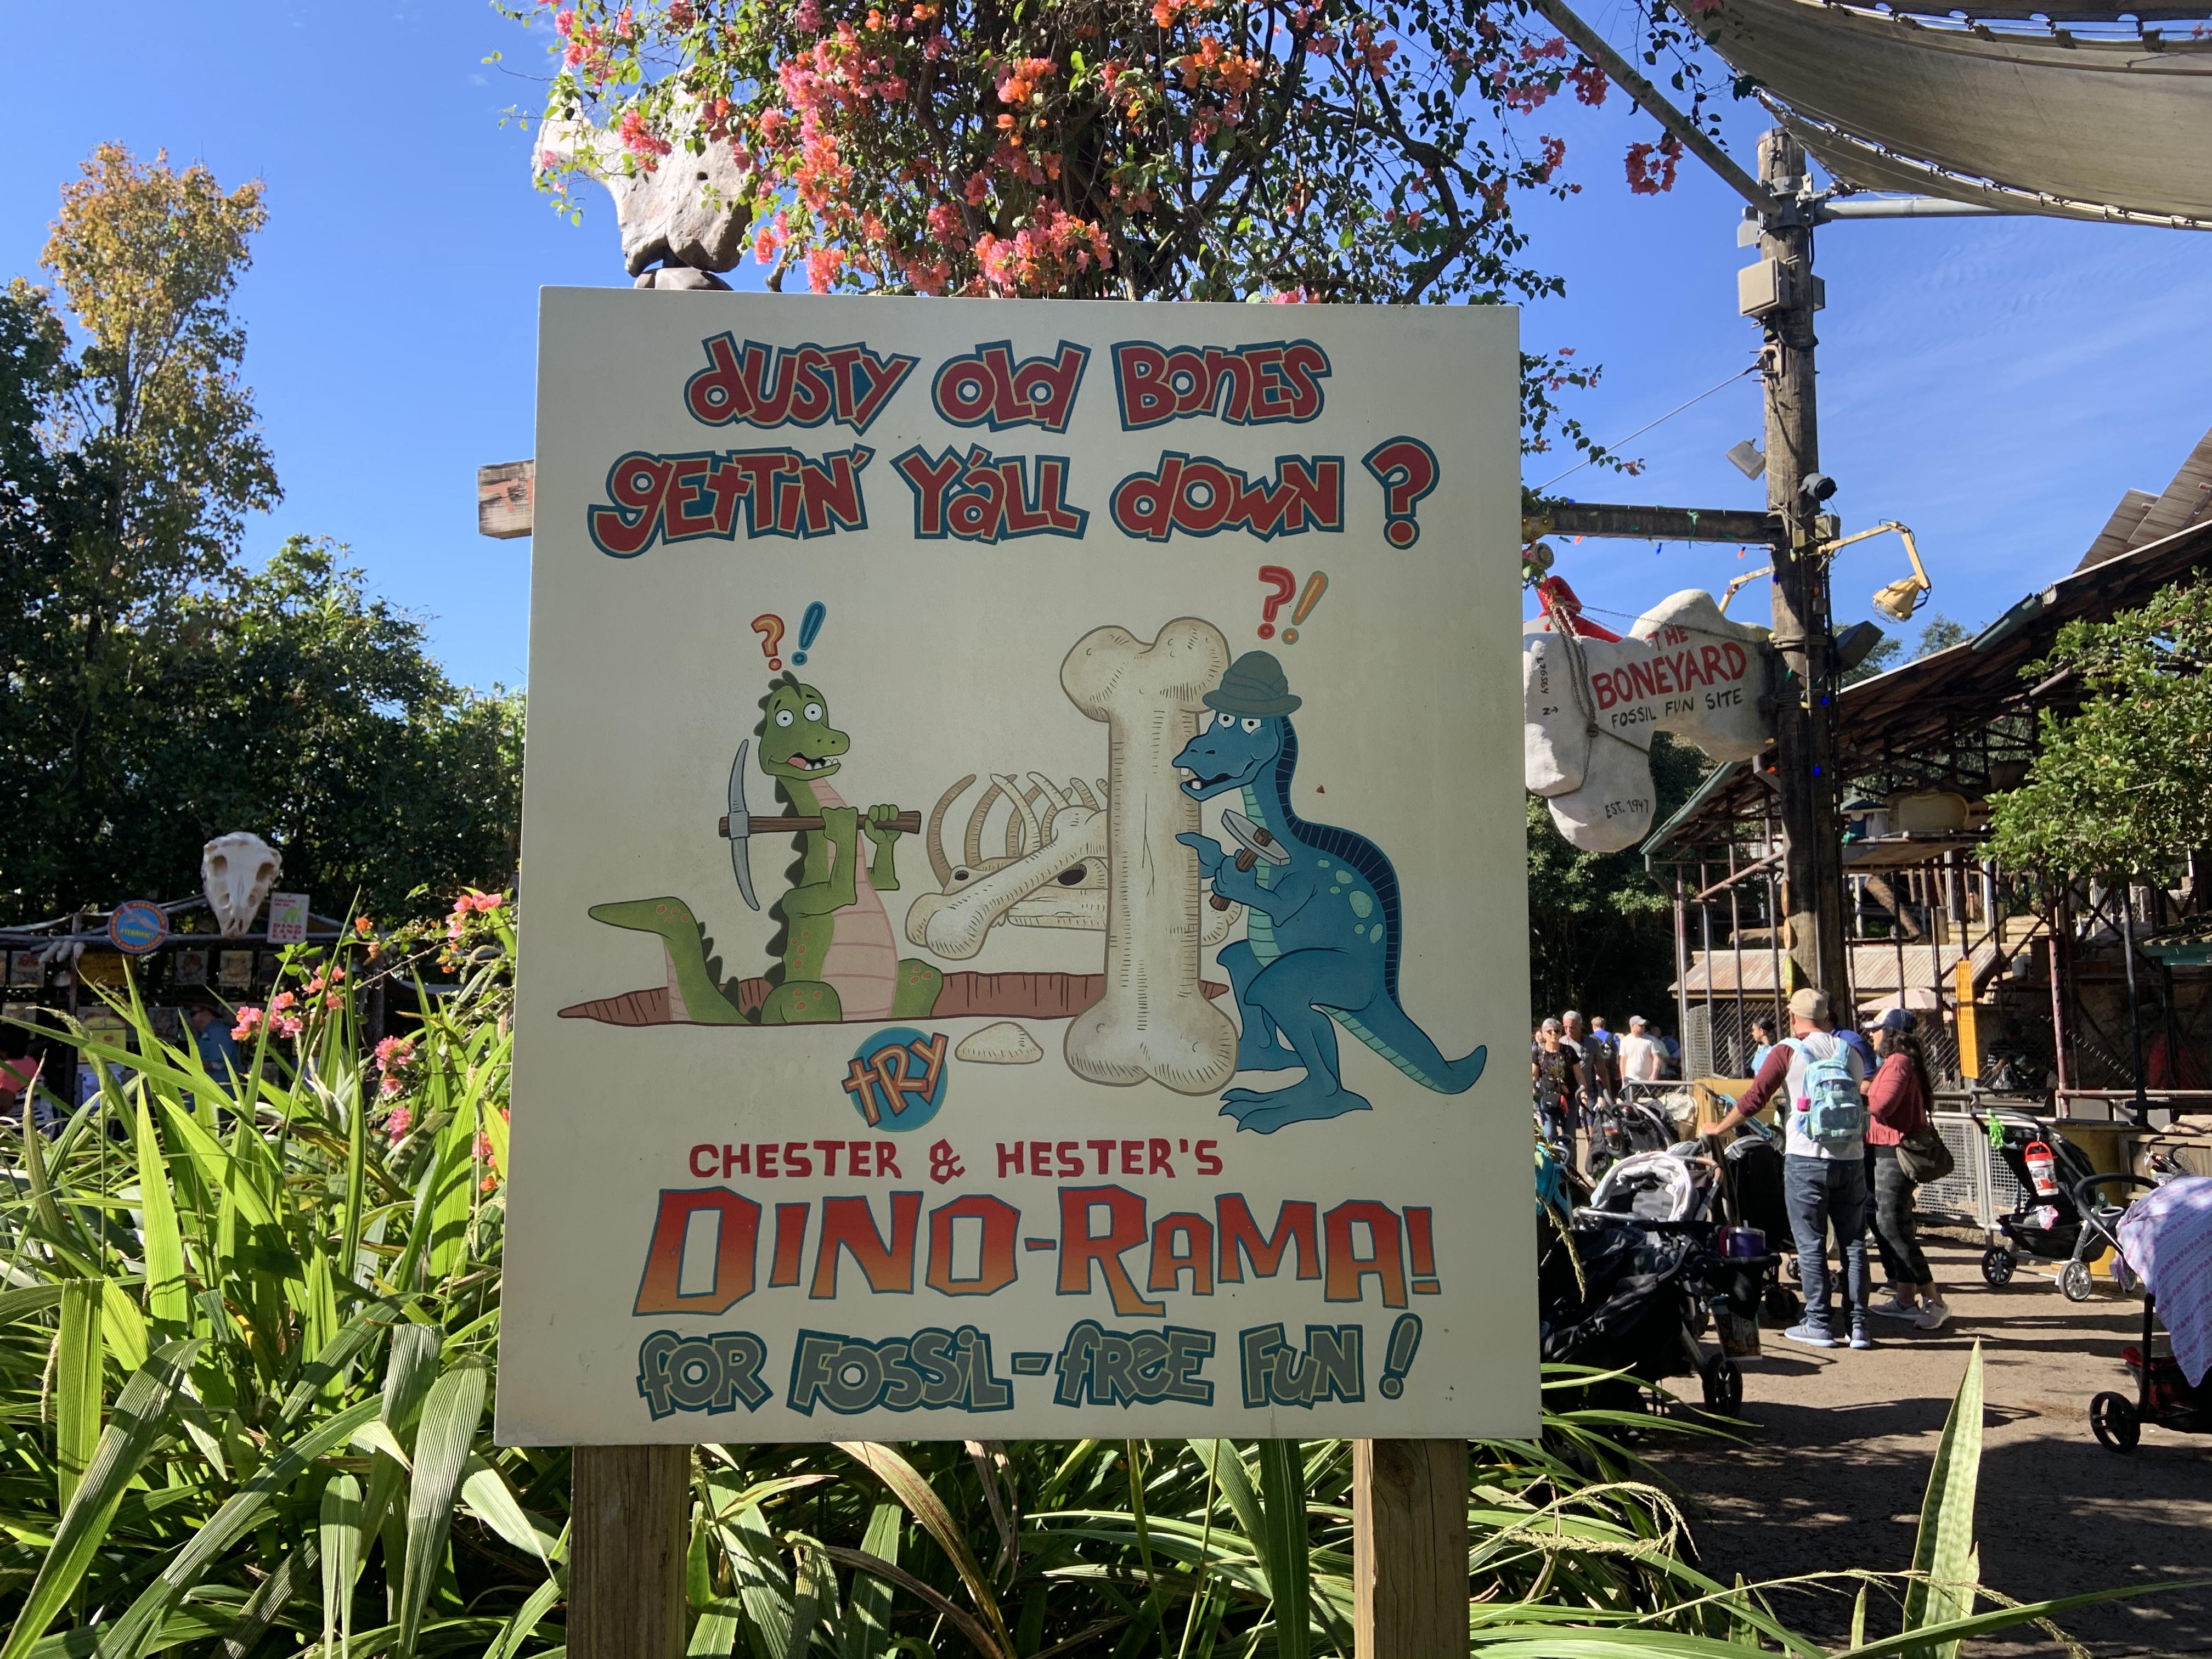 Dinoland sign 12/7/19